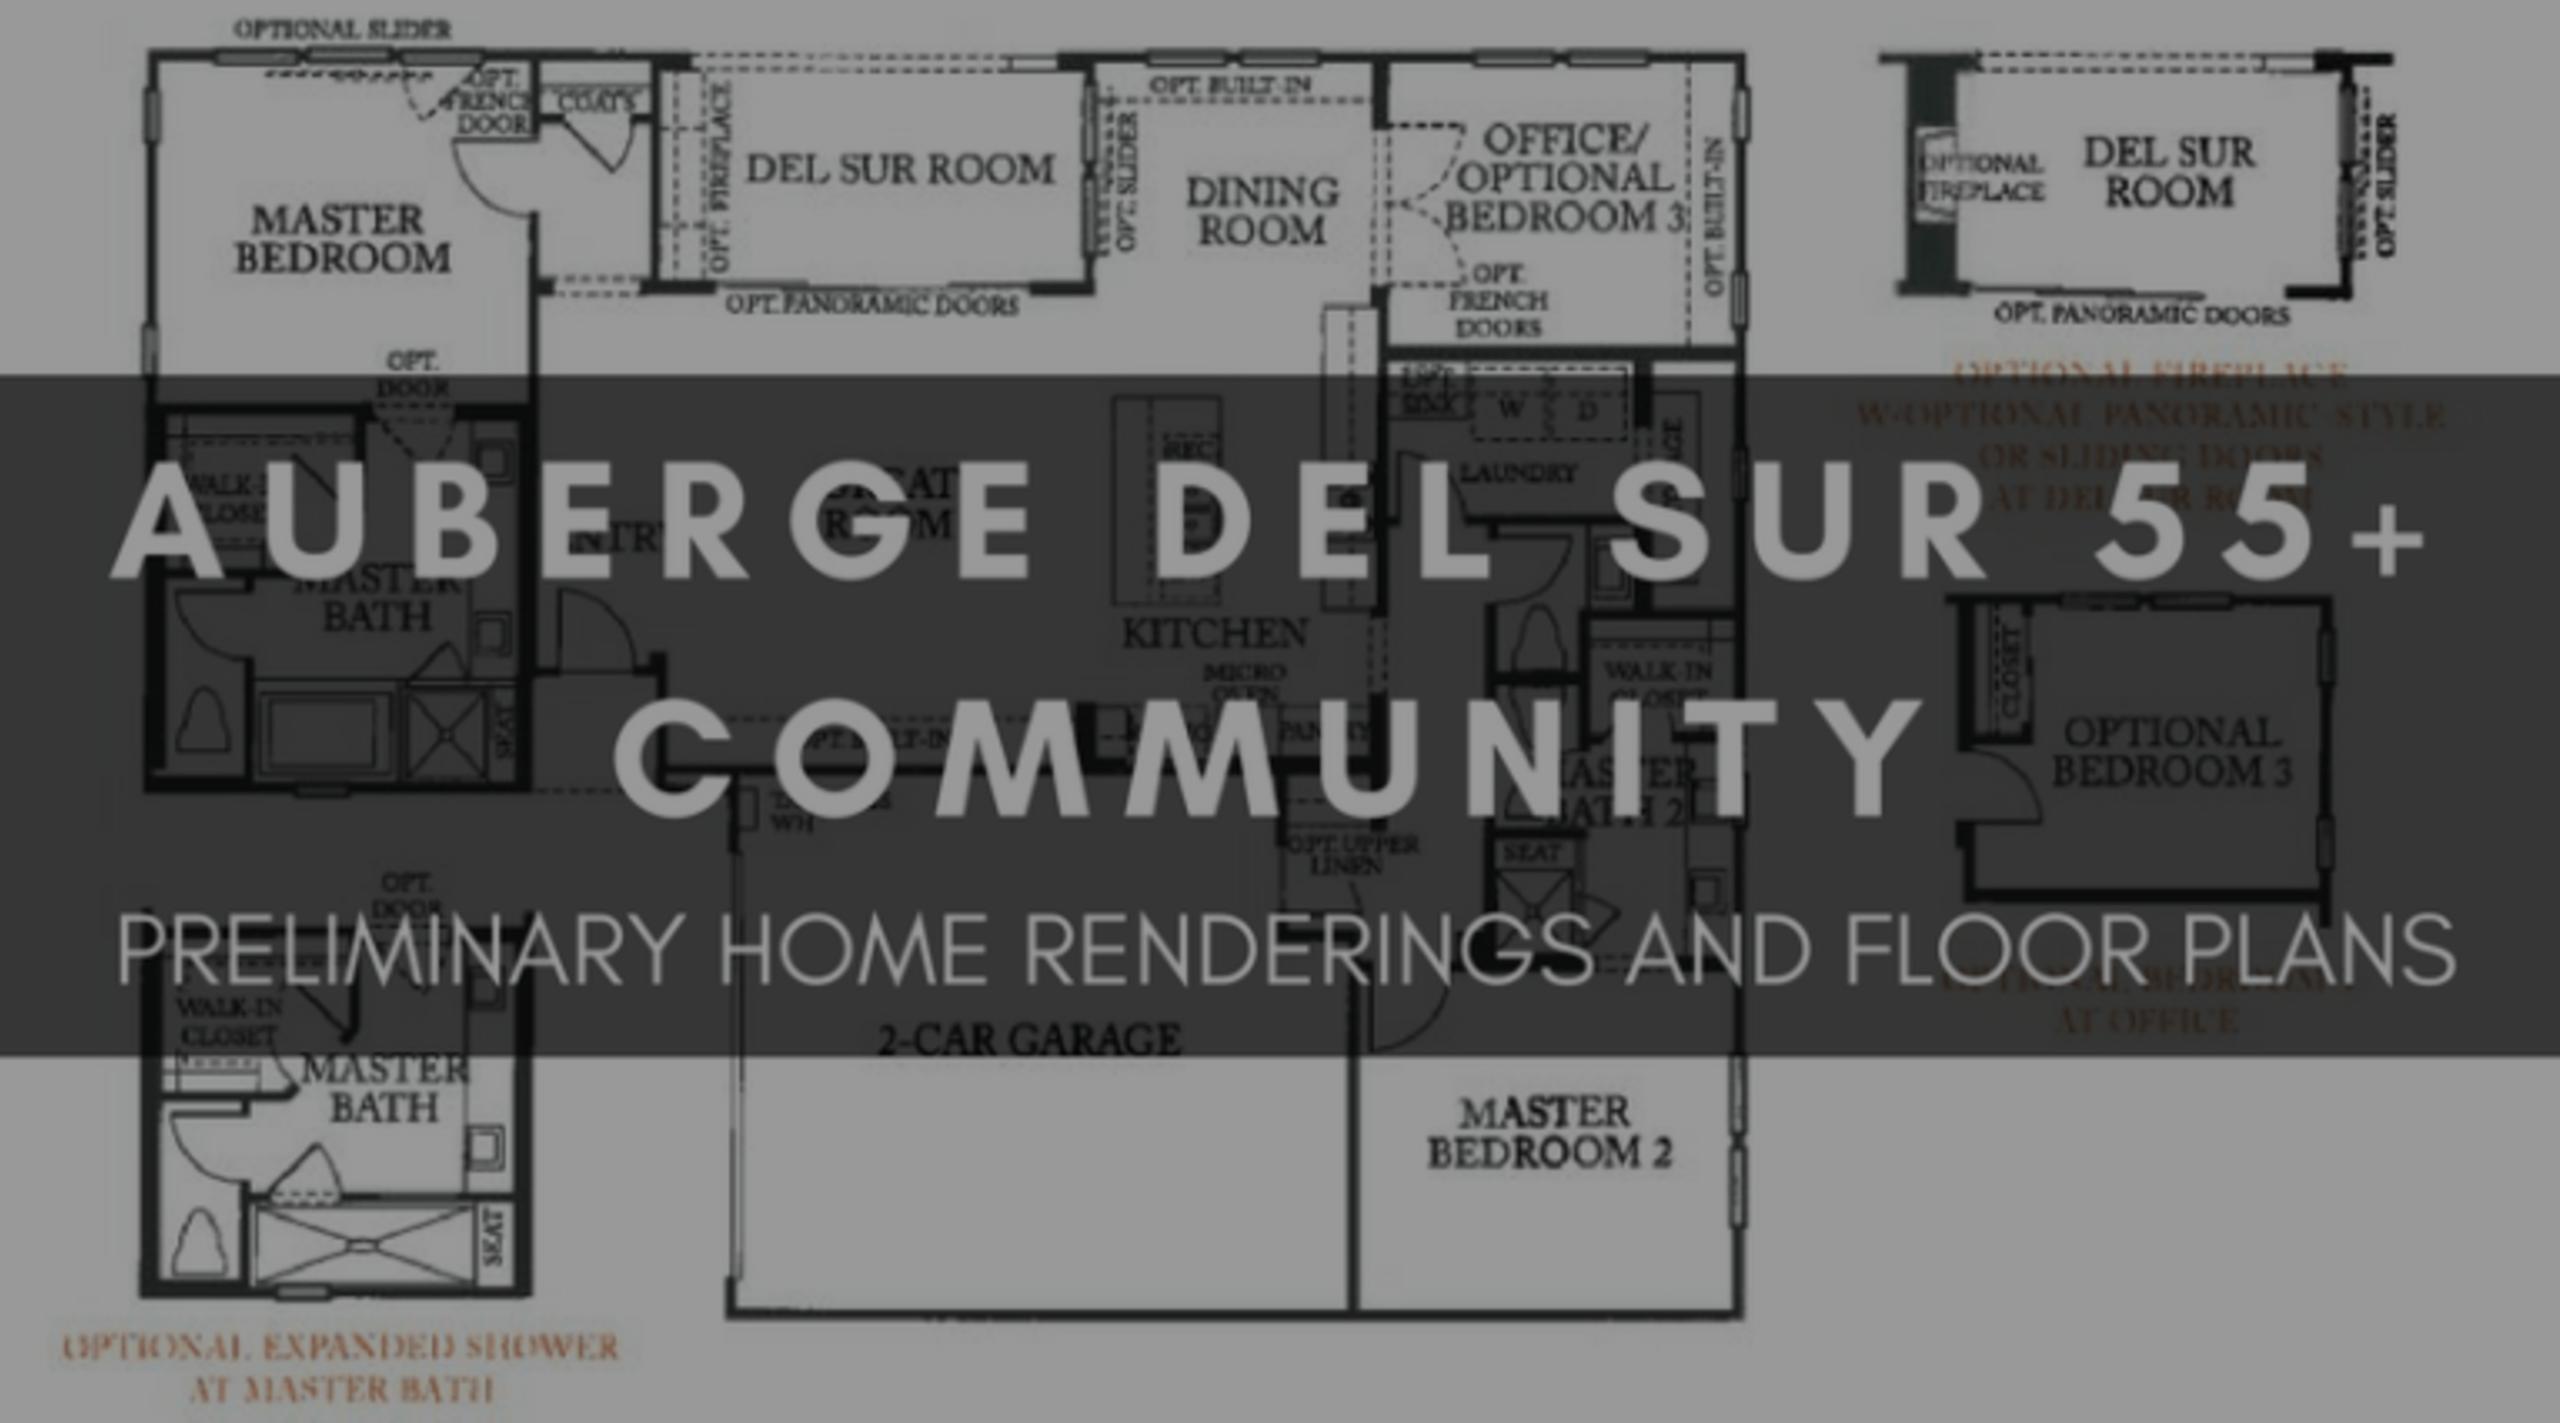 AUBERGE DEL SUR 55+ COMMUNITY | PRELIMINARY HOME RENDERINGS AND FLOOR PLANS